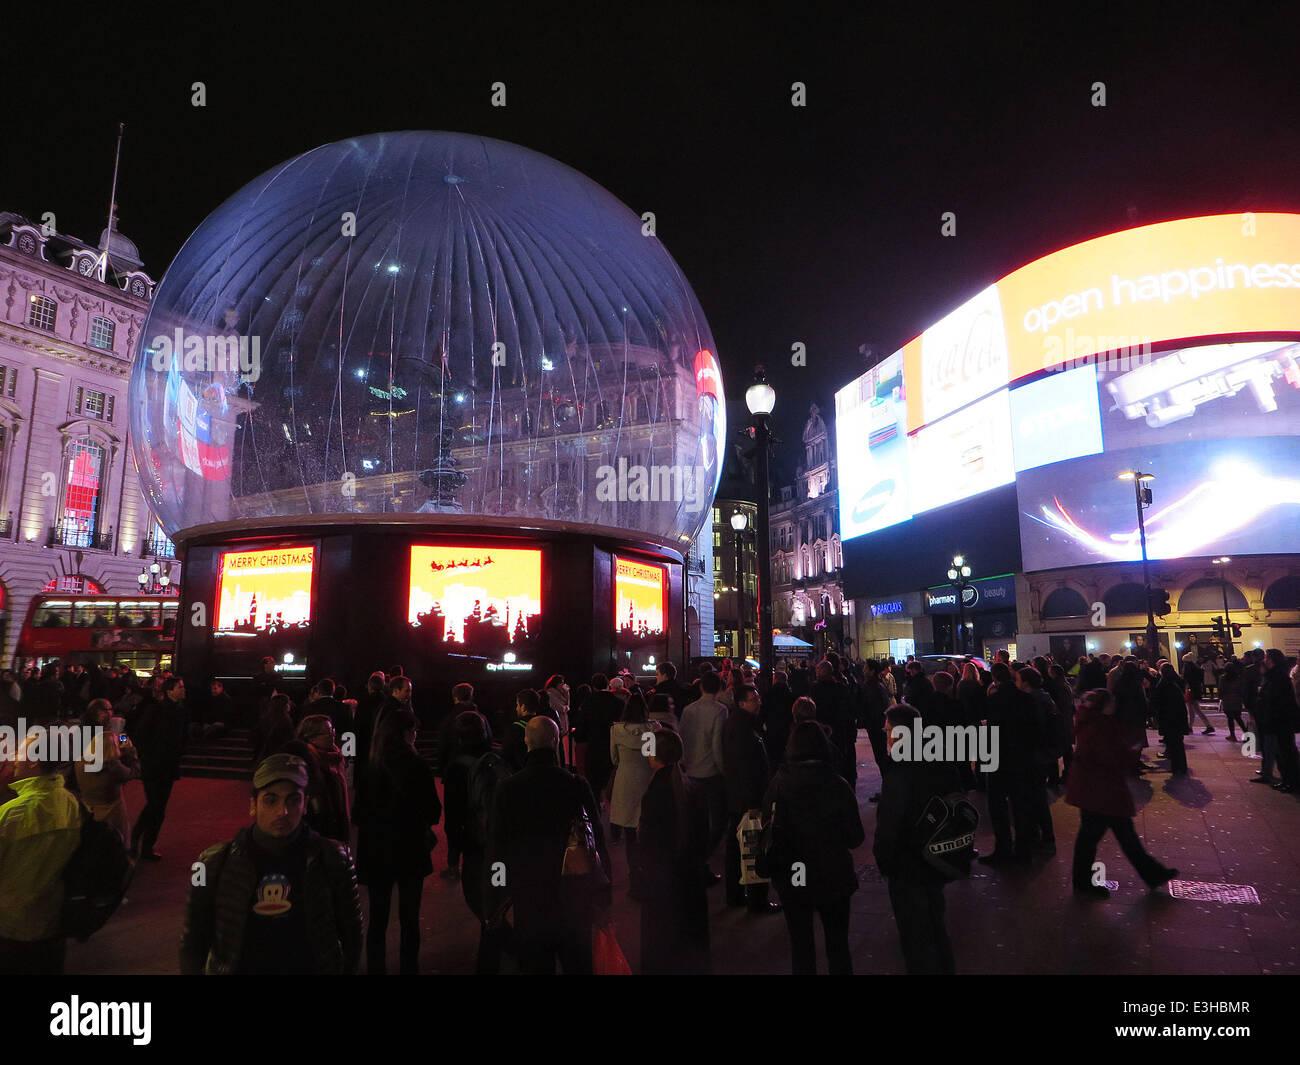 Inflatable Snow Globe Stockfotos & Inflatable Snow Globe Bilder - Alamy